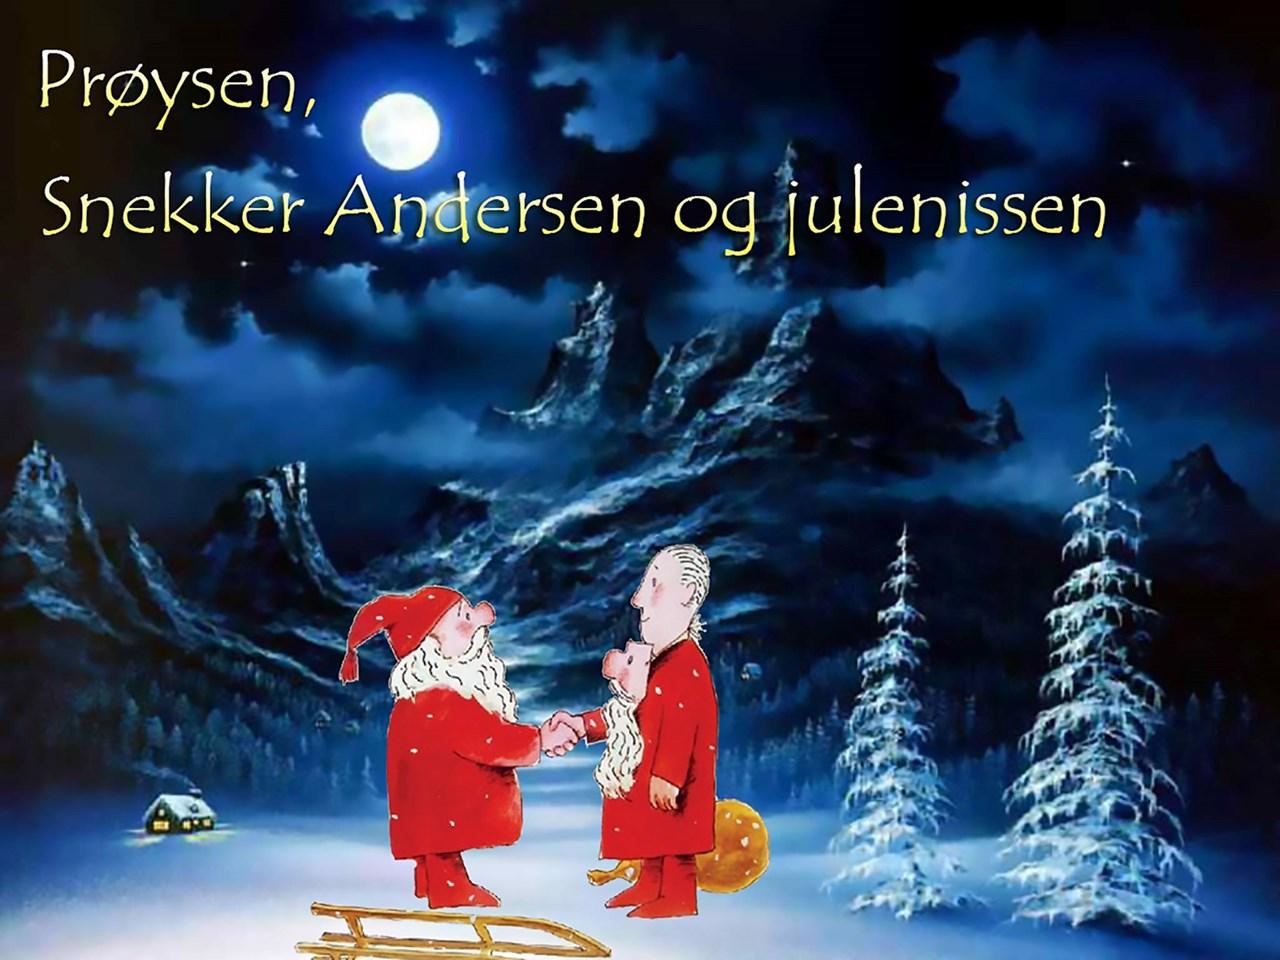 Prøysen, snekker Andersen og julenissen // Bakkenteigen Kulturhus